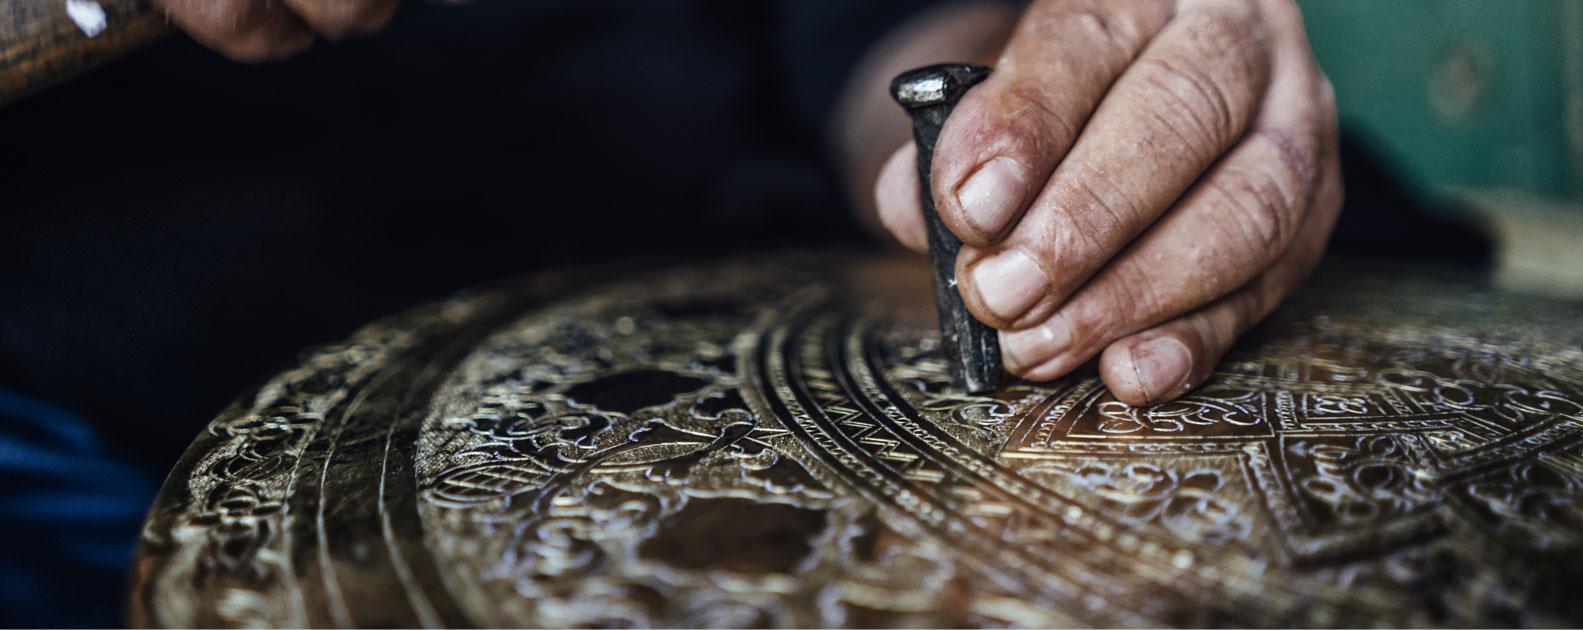 artisanat traditionnnel